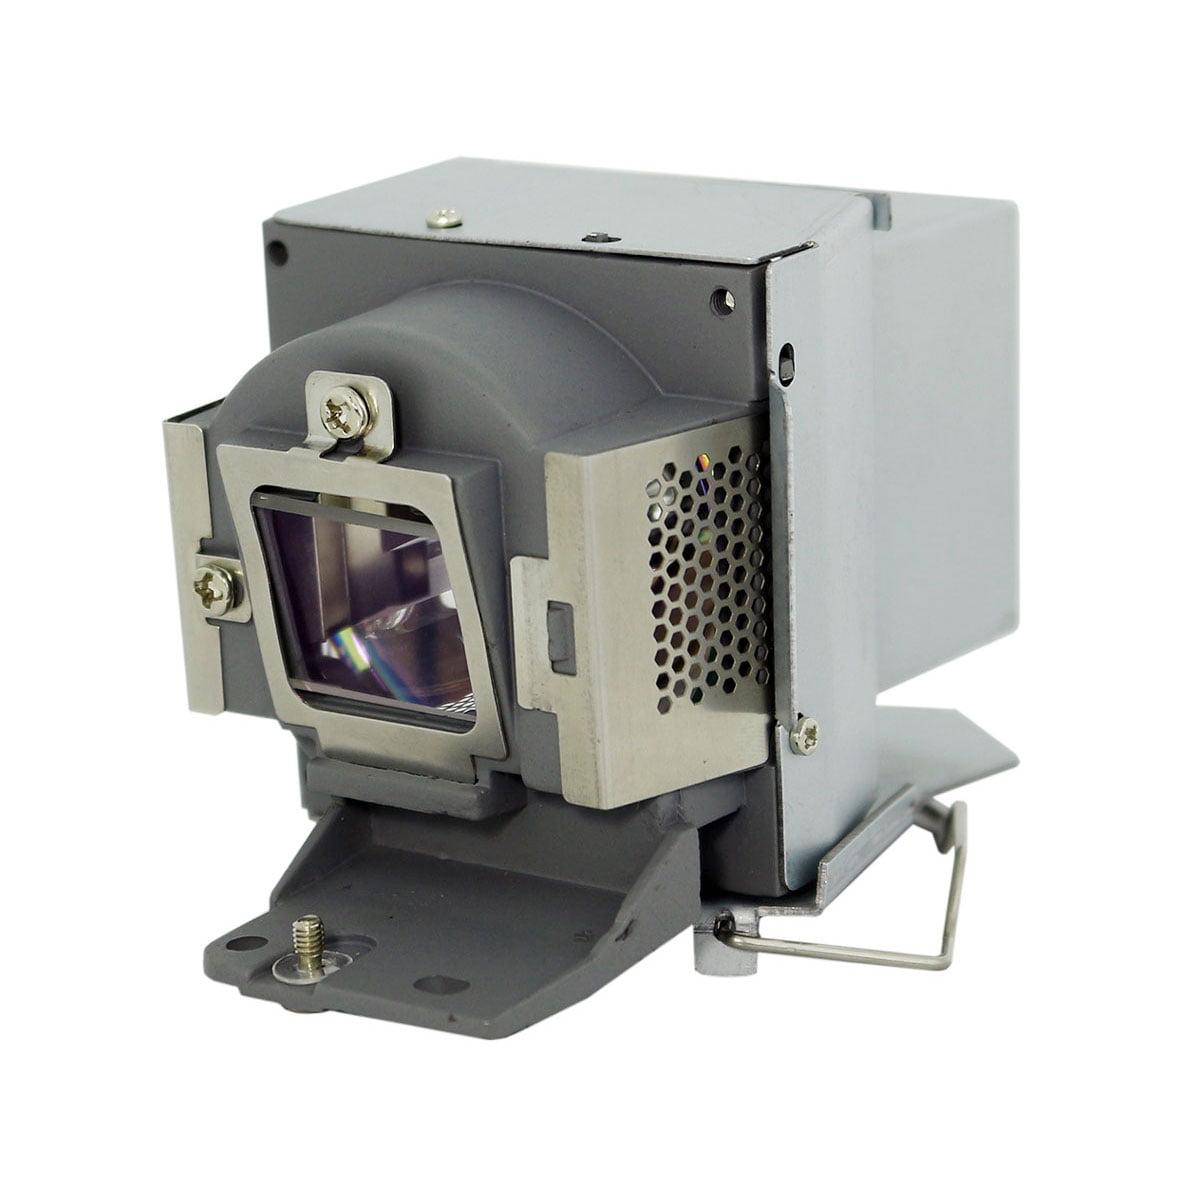 Acer MC.JEL11.001 Projector Lamp Housing DLP LCD